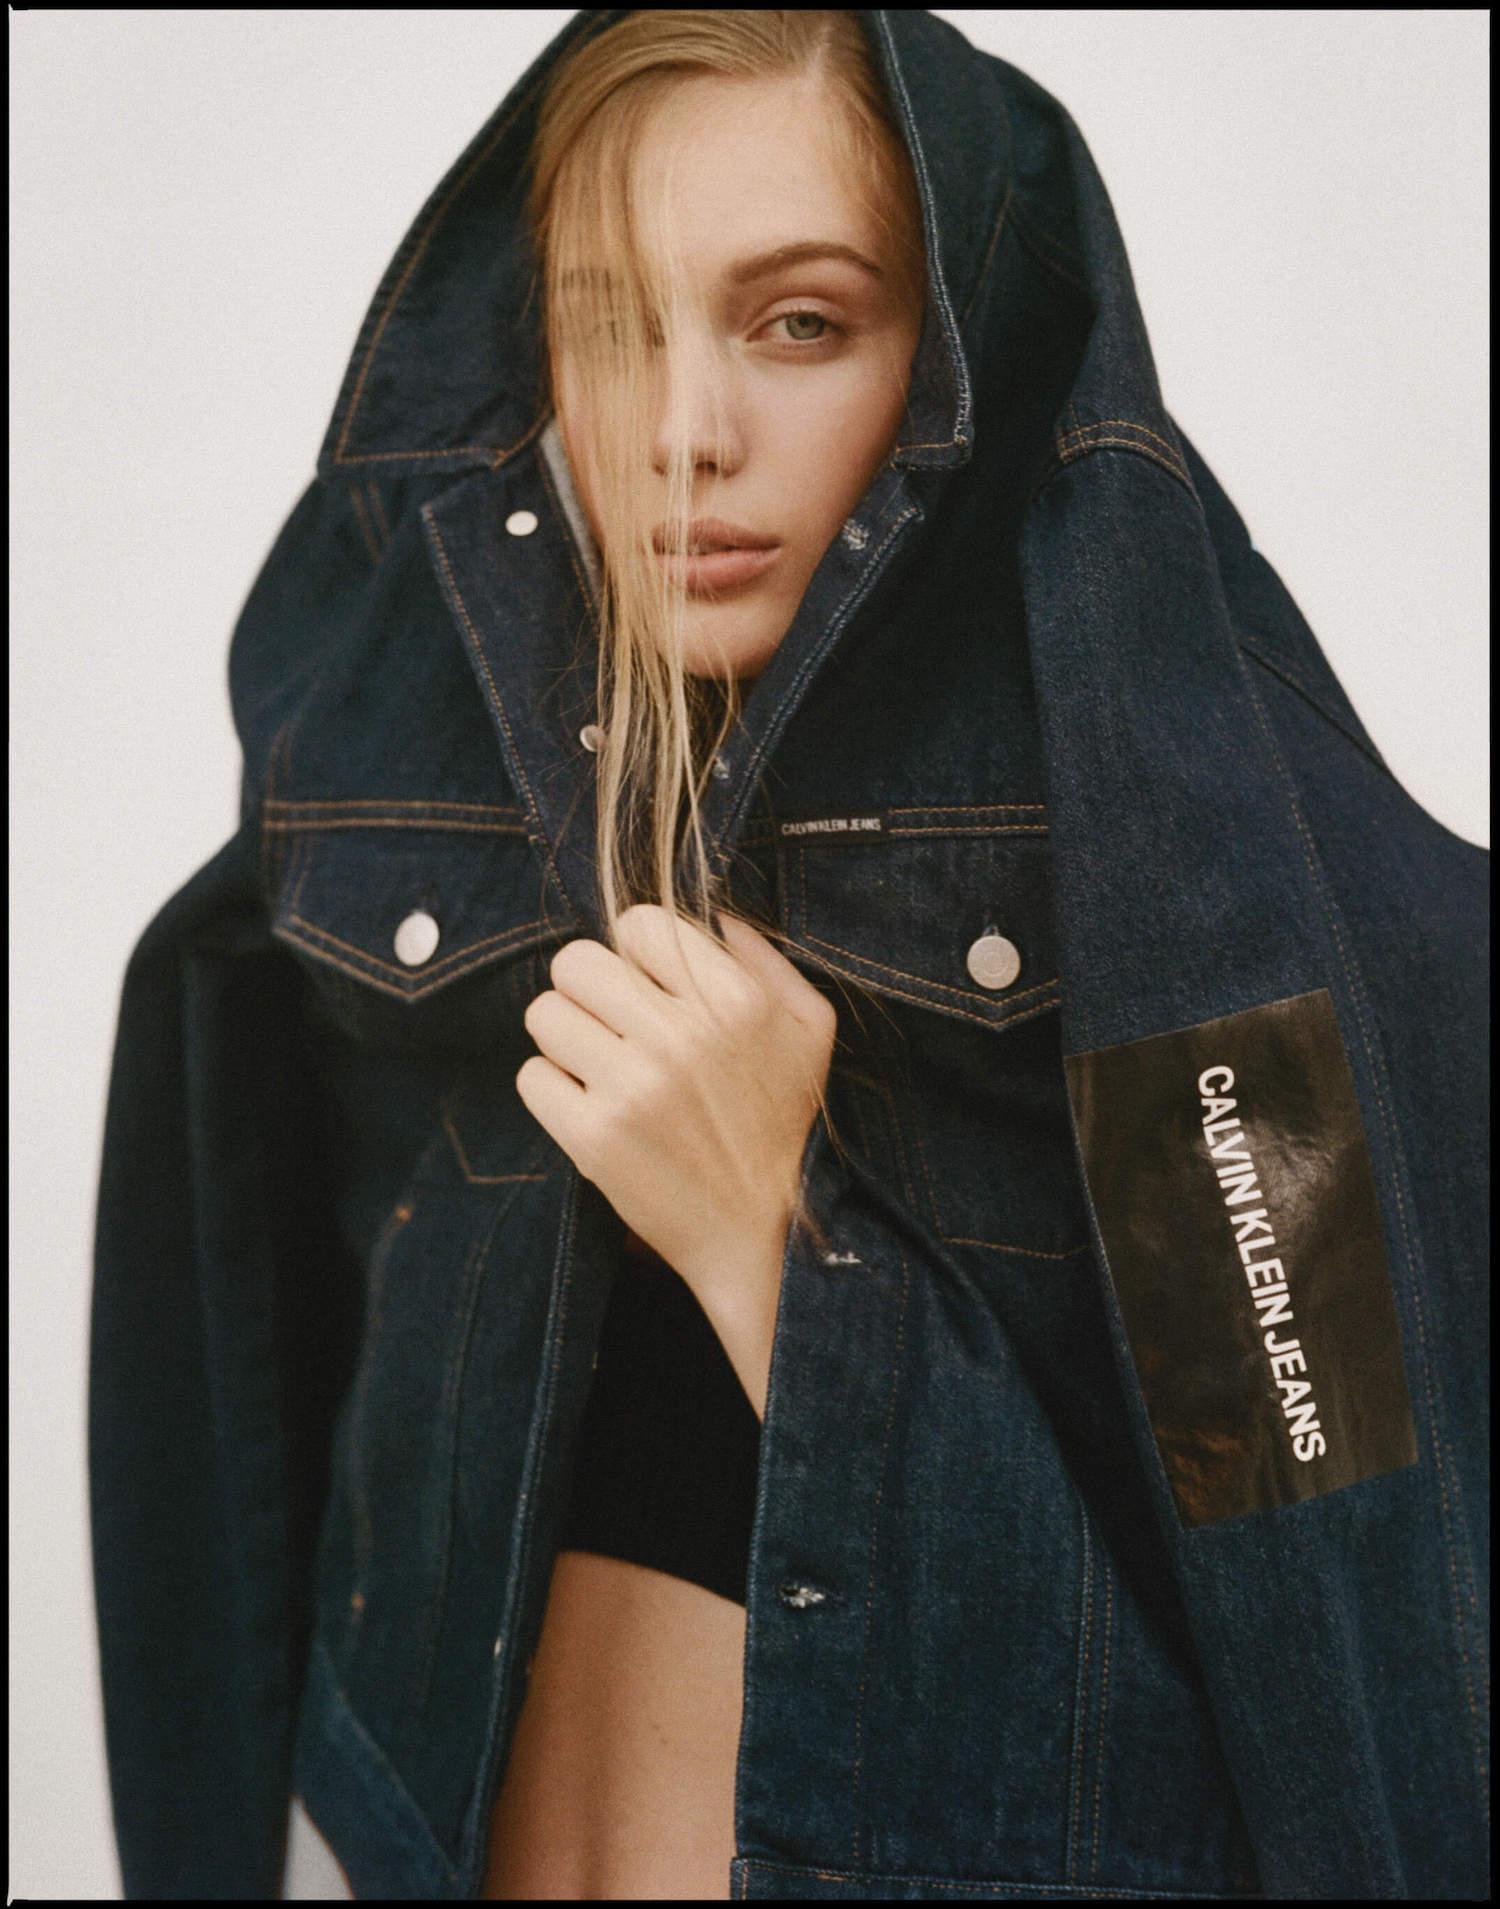 Karolina Egersdorfova by Connor Langford for Doingbird